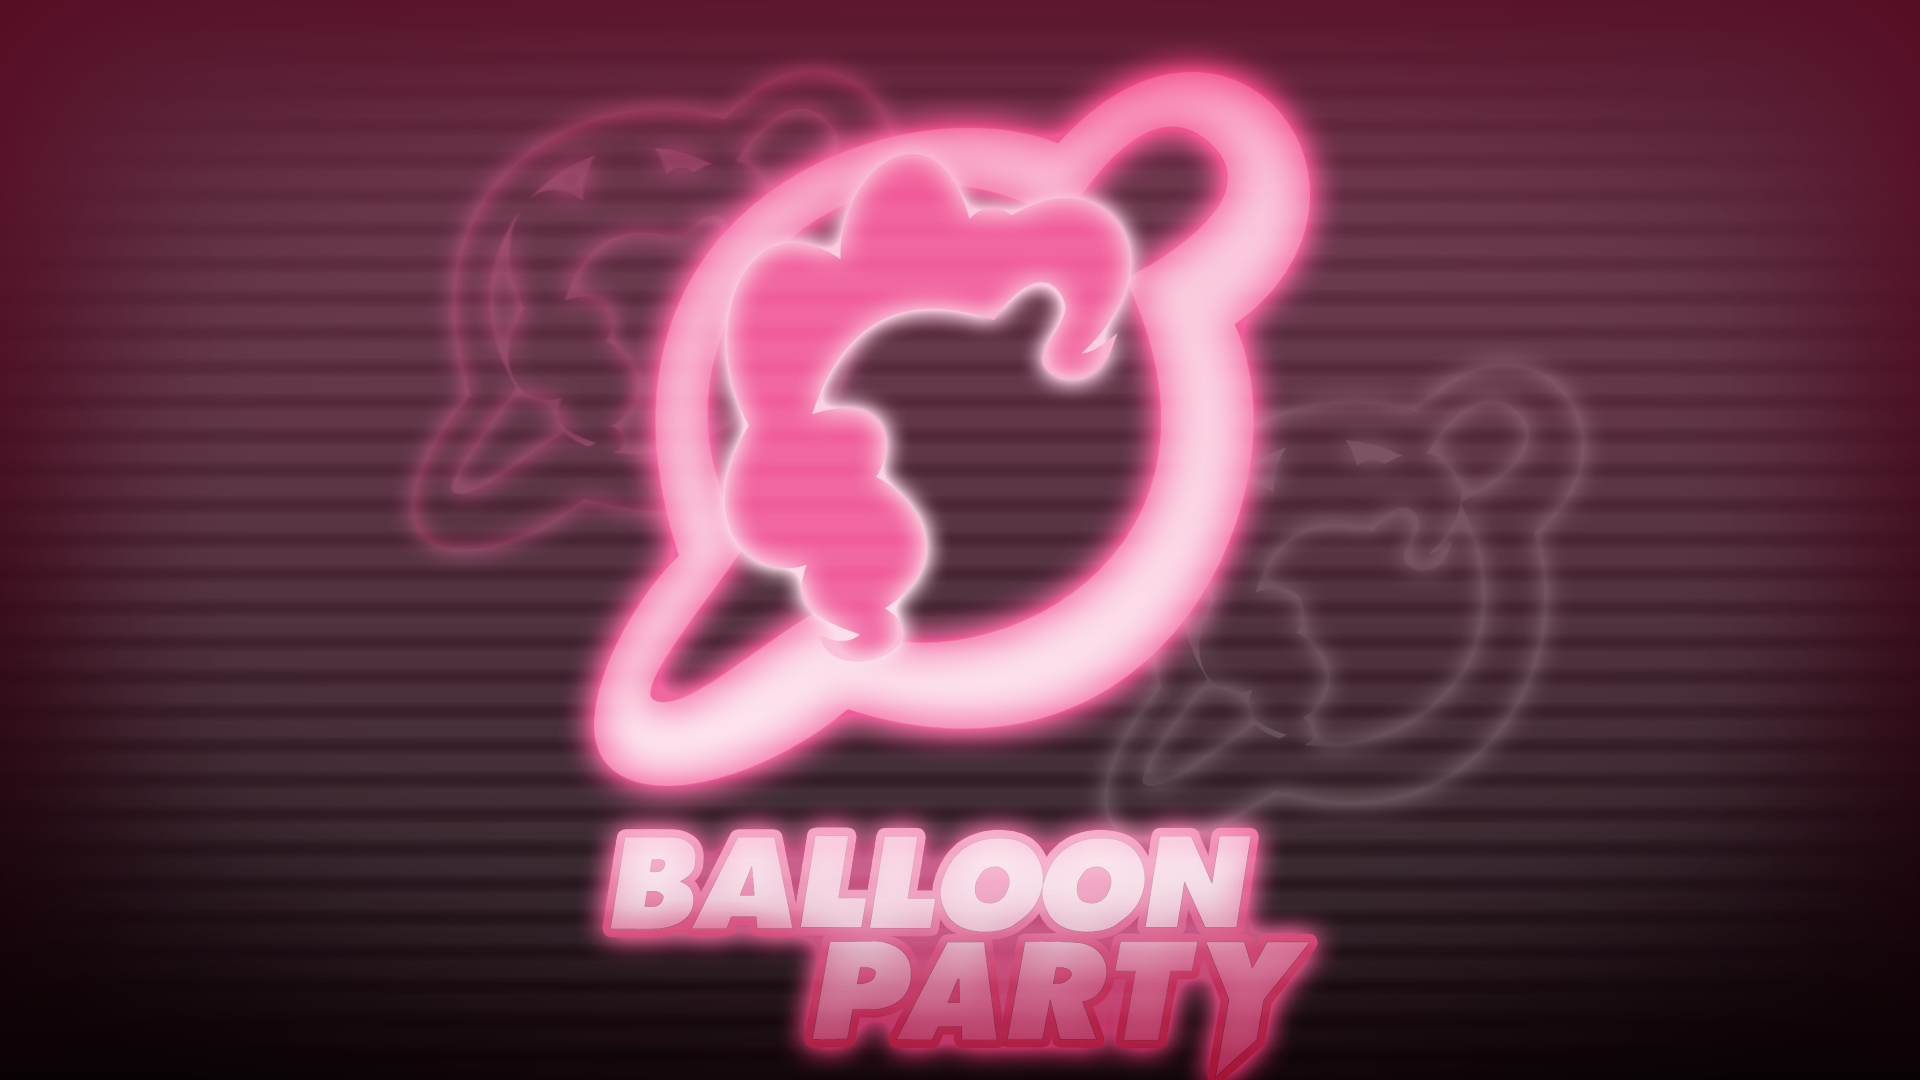 Balloon Party Pink Glow by KibbieTheGreat